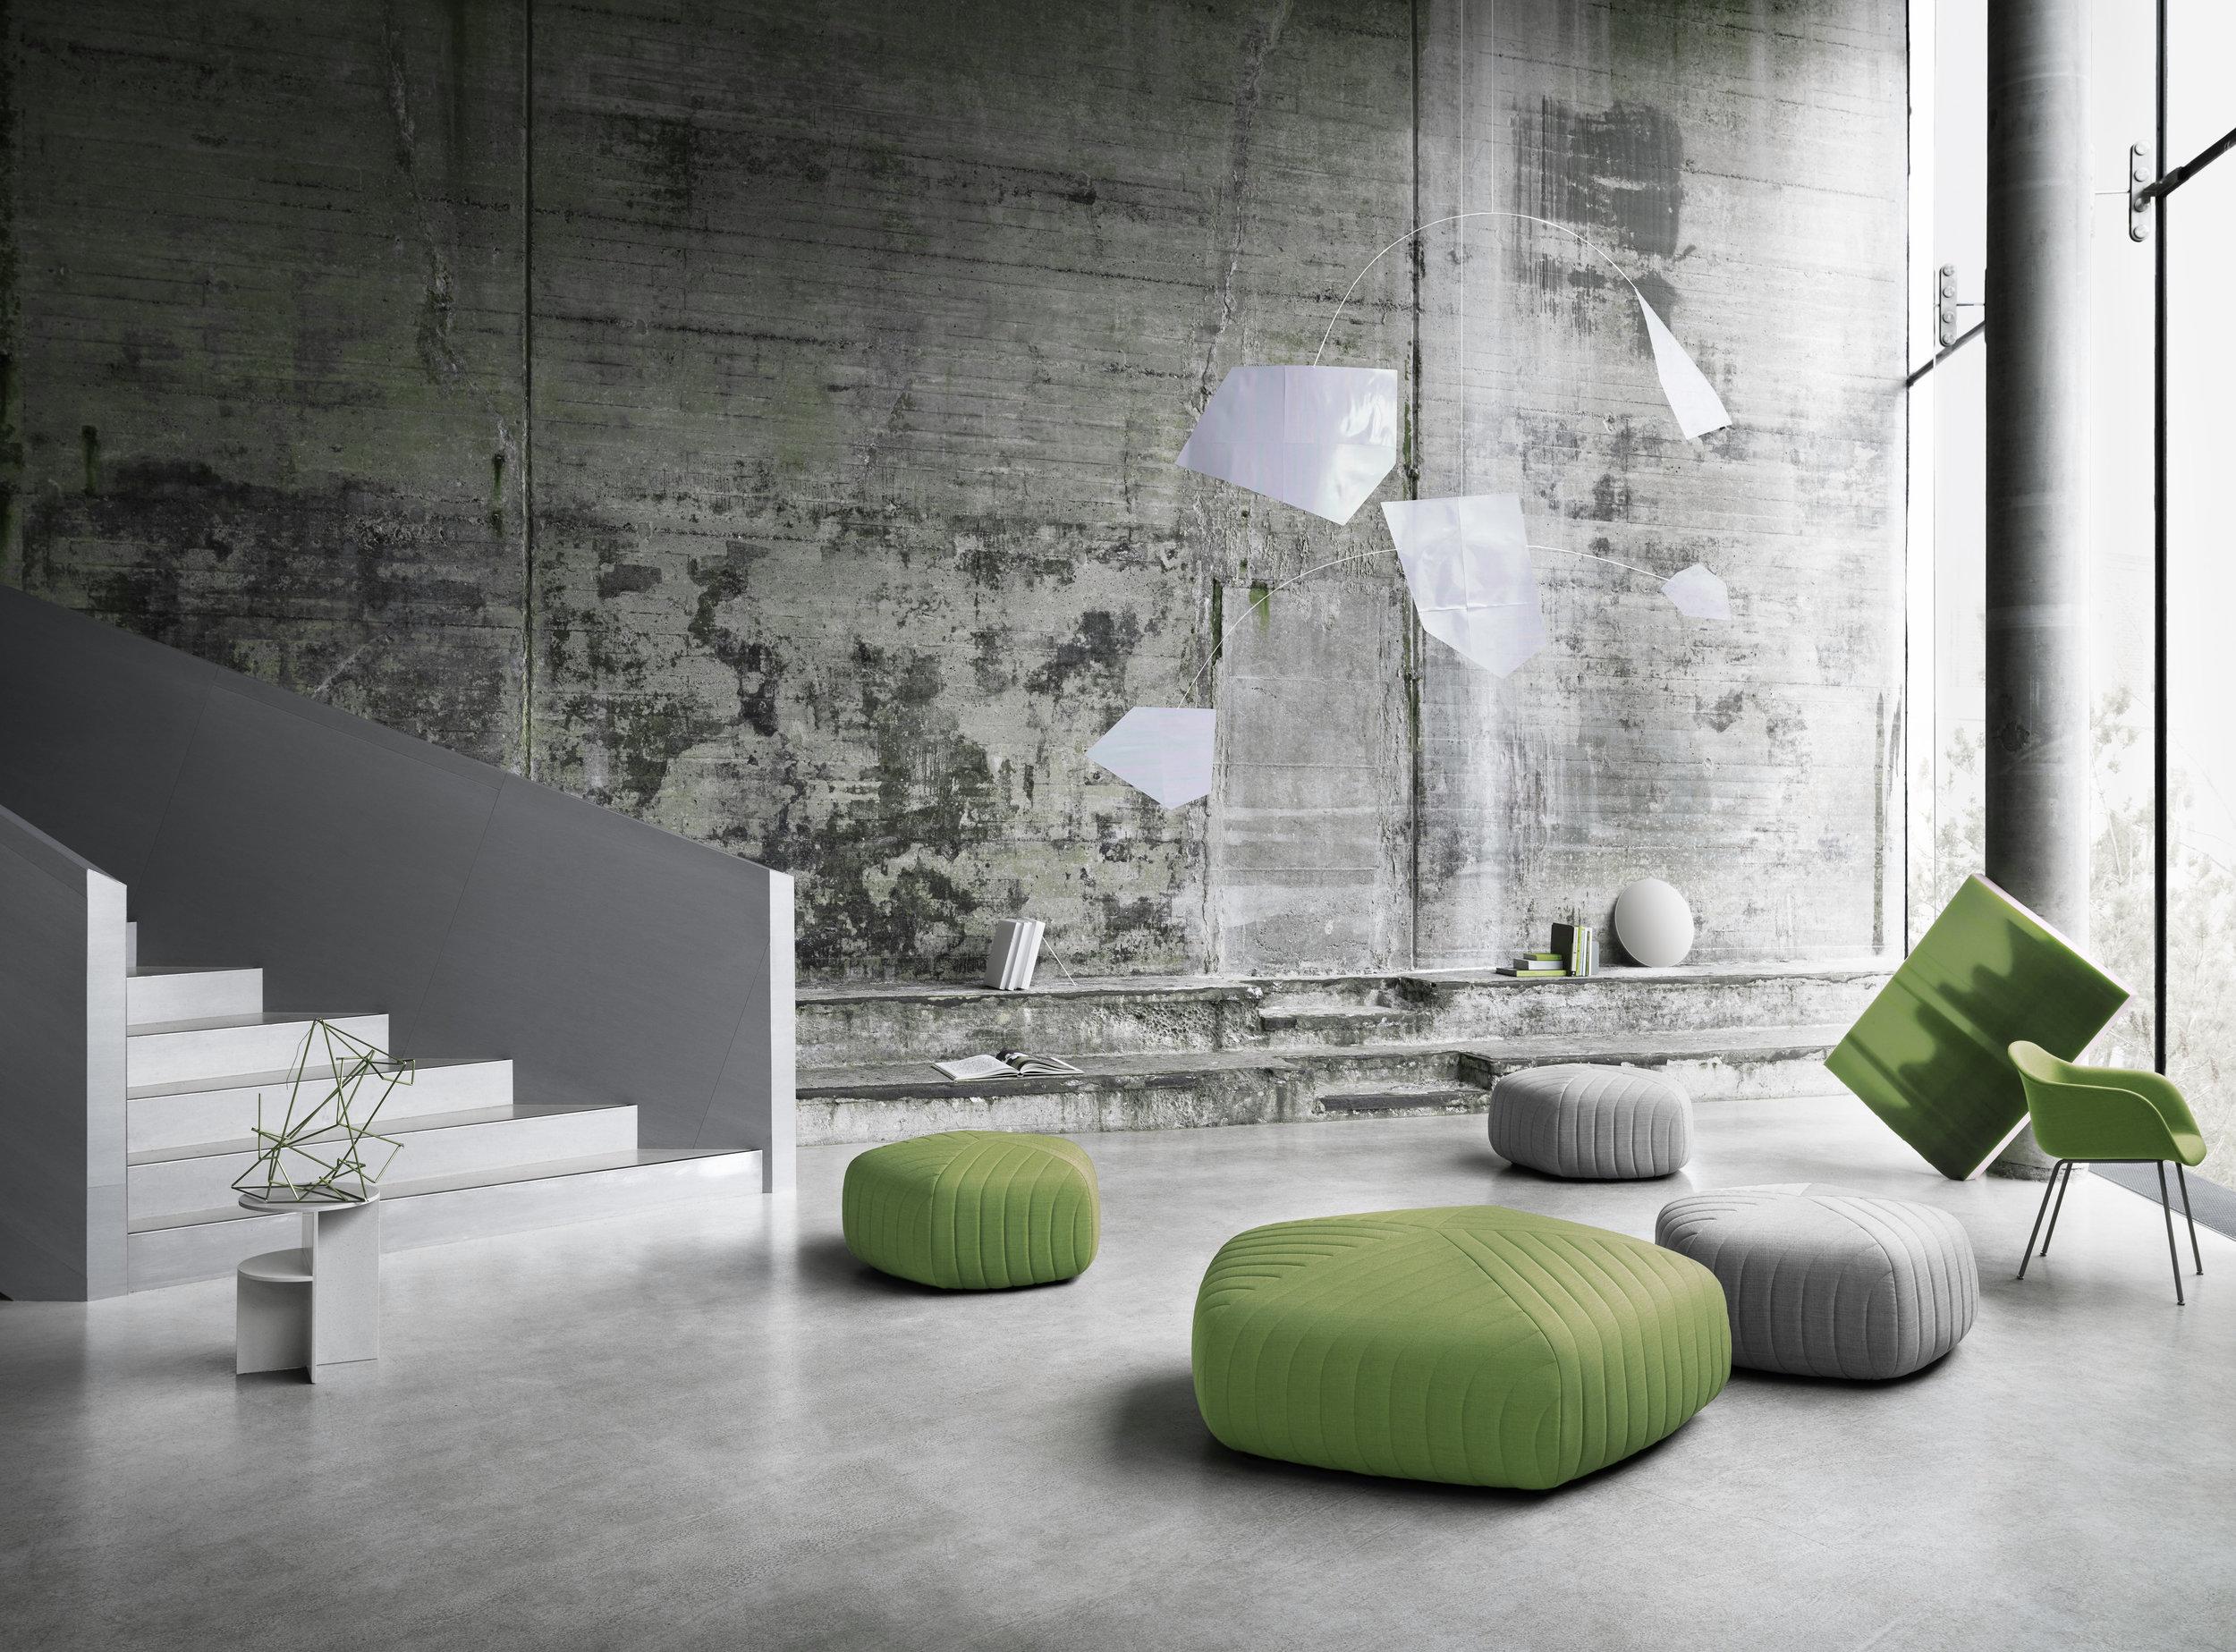 Five-xl-fiber-armchair-halves-high-res-lifestyle.jpg